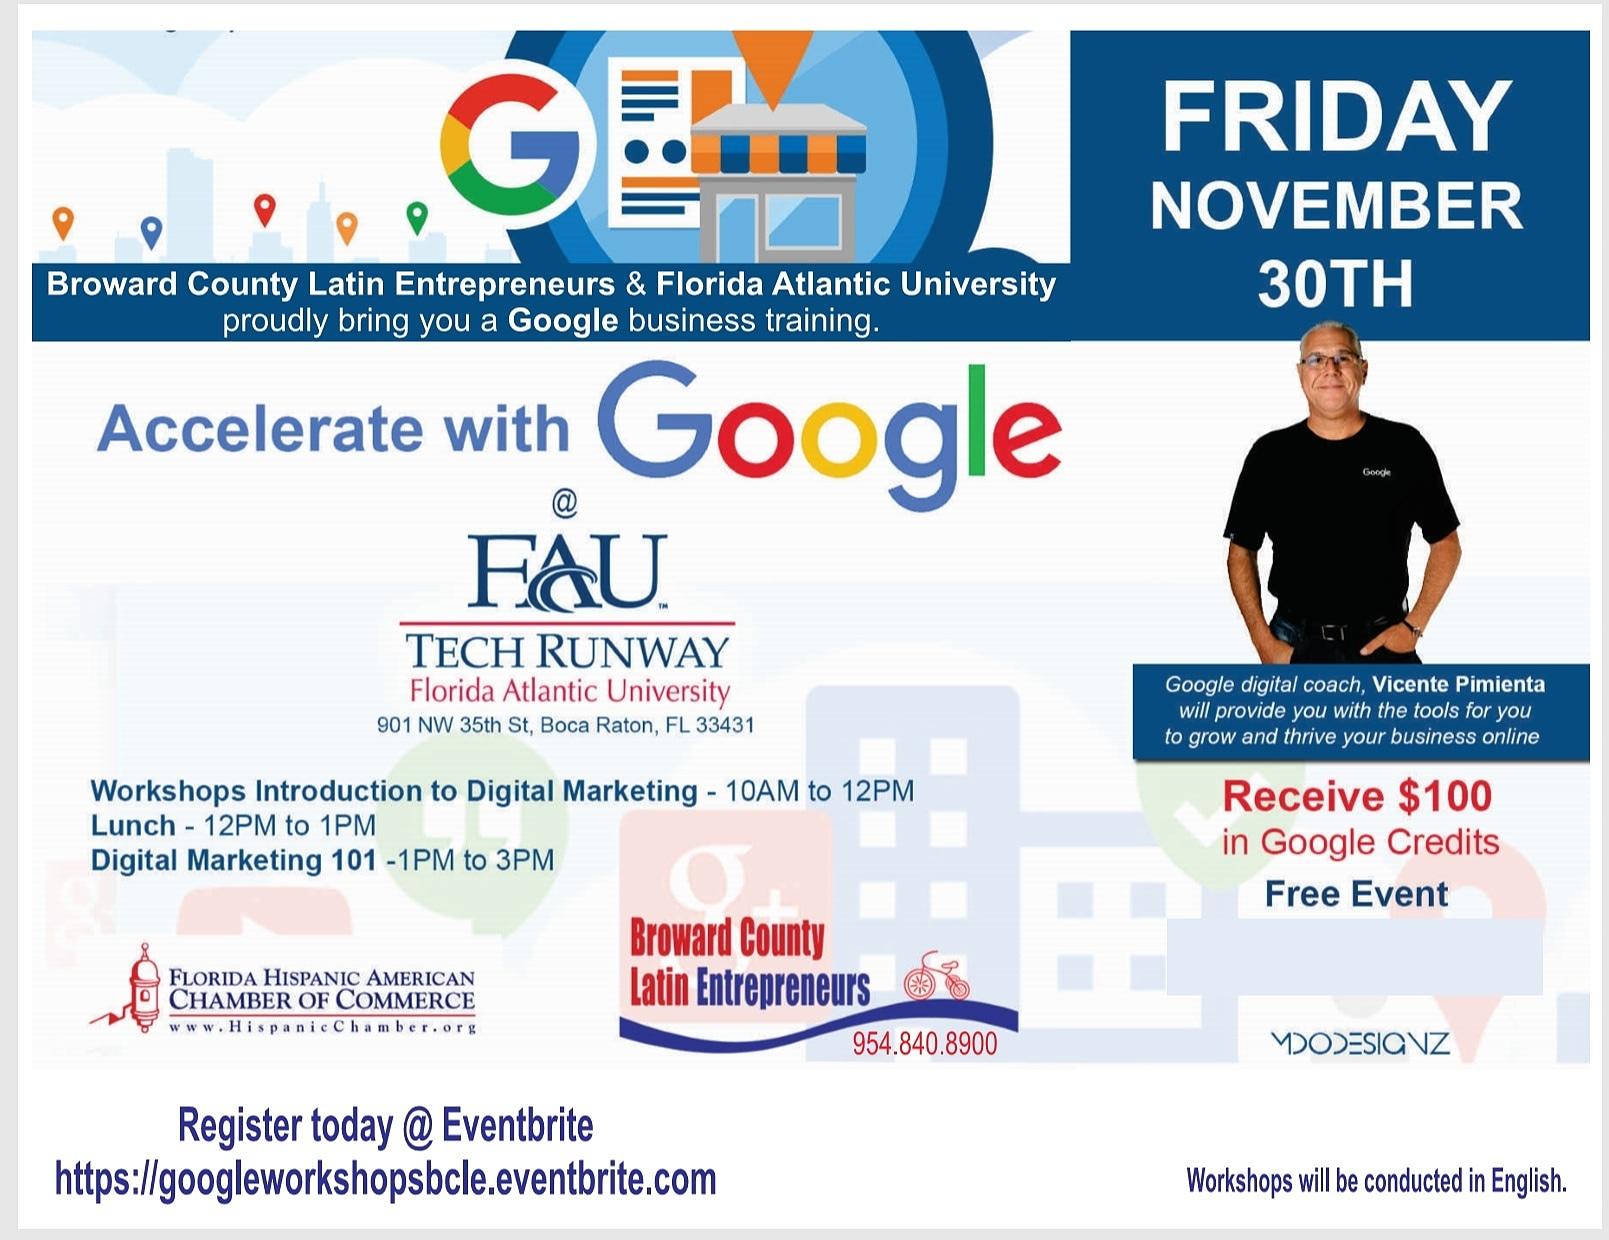 Two Google Digital Marketing workshops in one day!